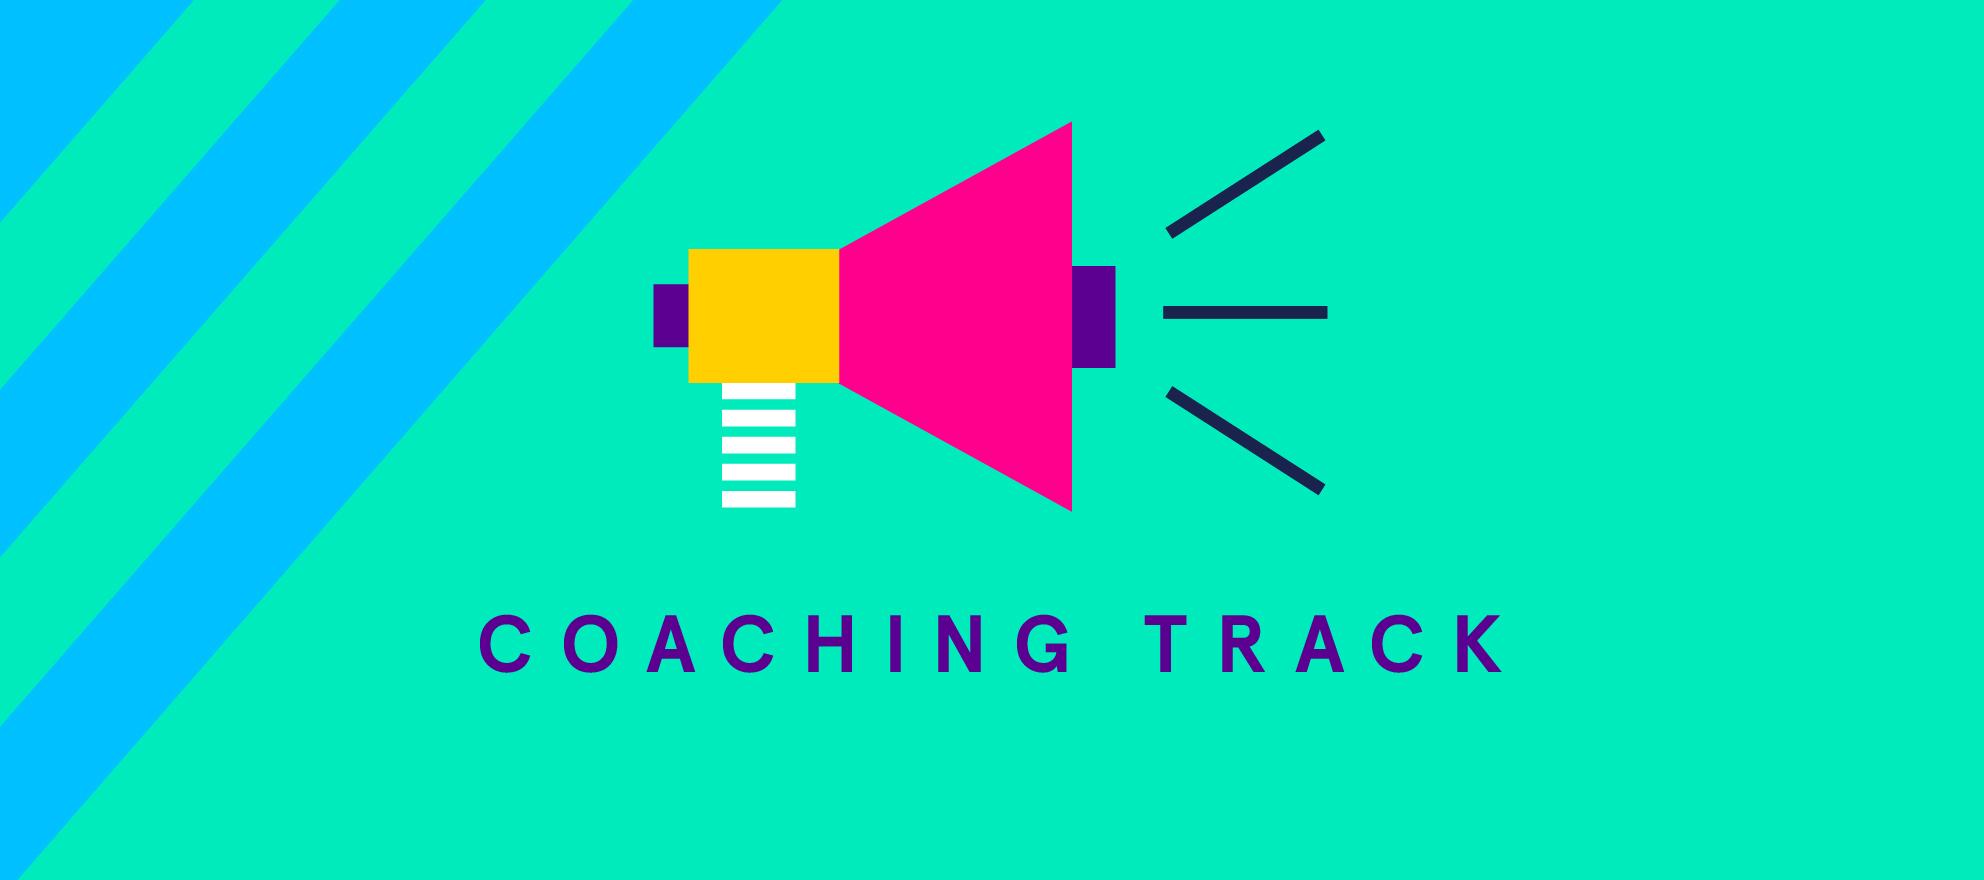 coaching track inman connect san francisco